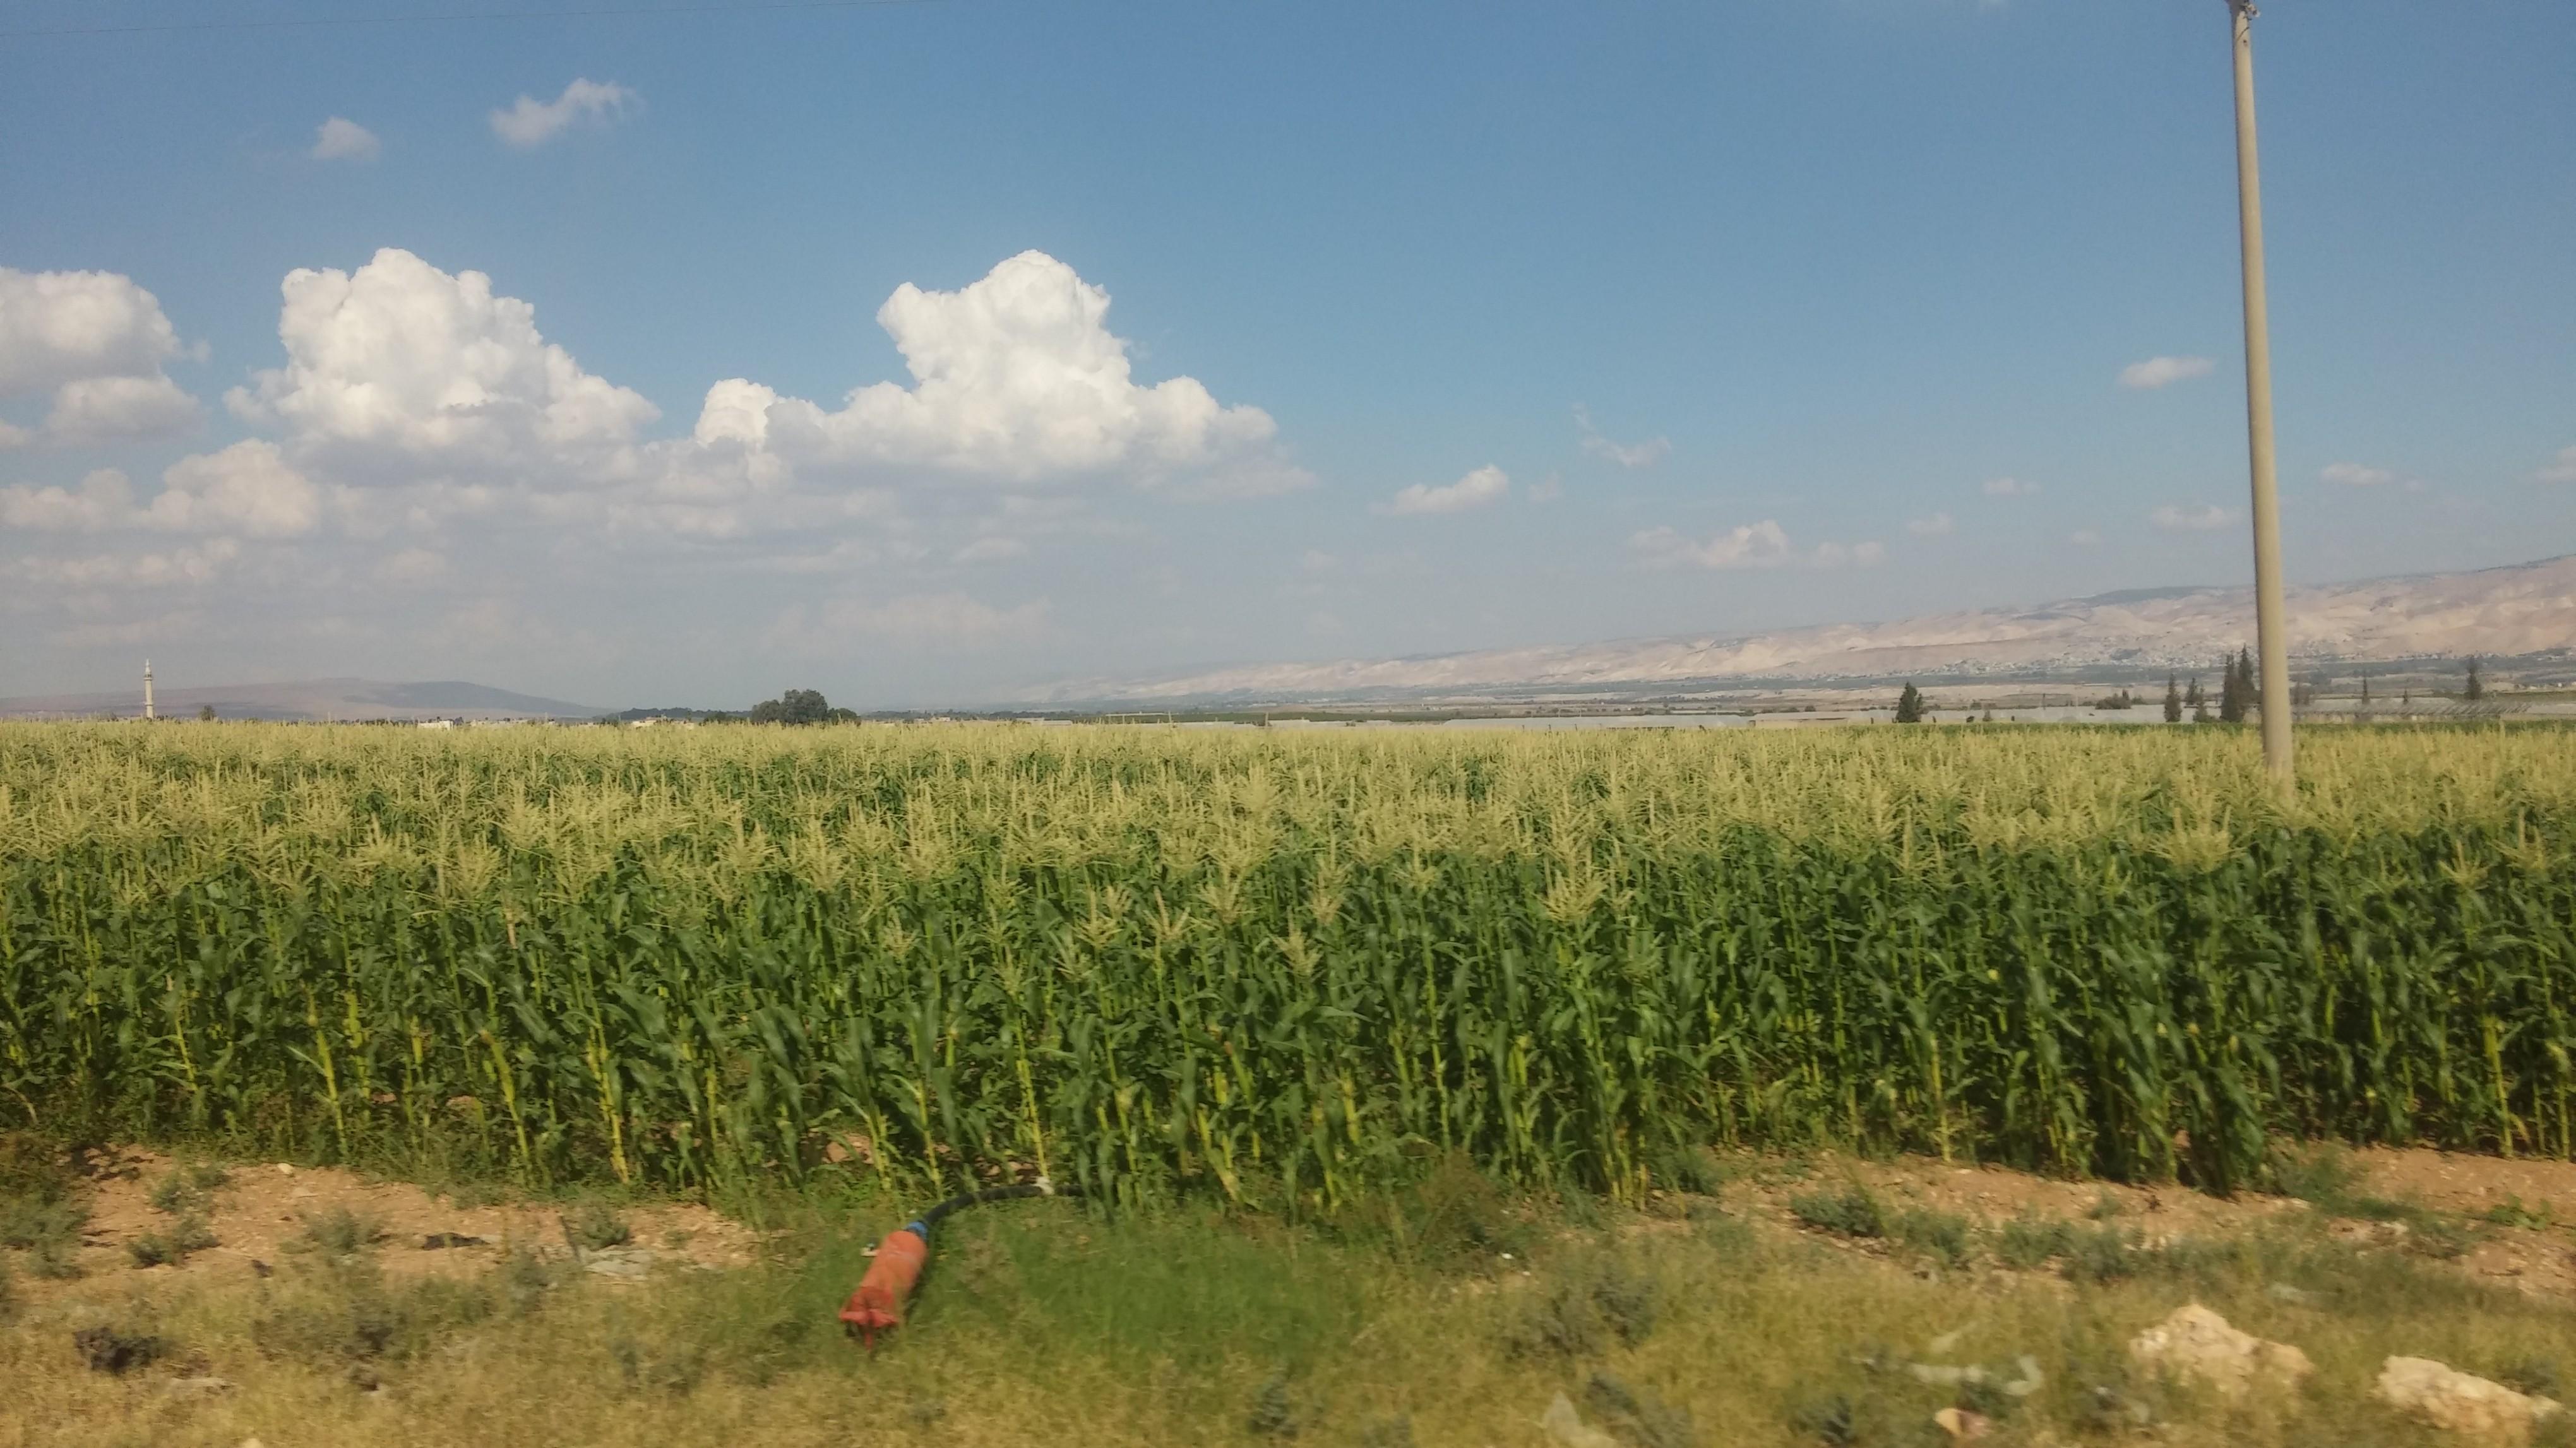 Cornfield in the Jordan River Valley (Photo:  Rodrigo Rodriguez)